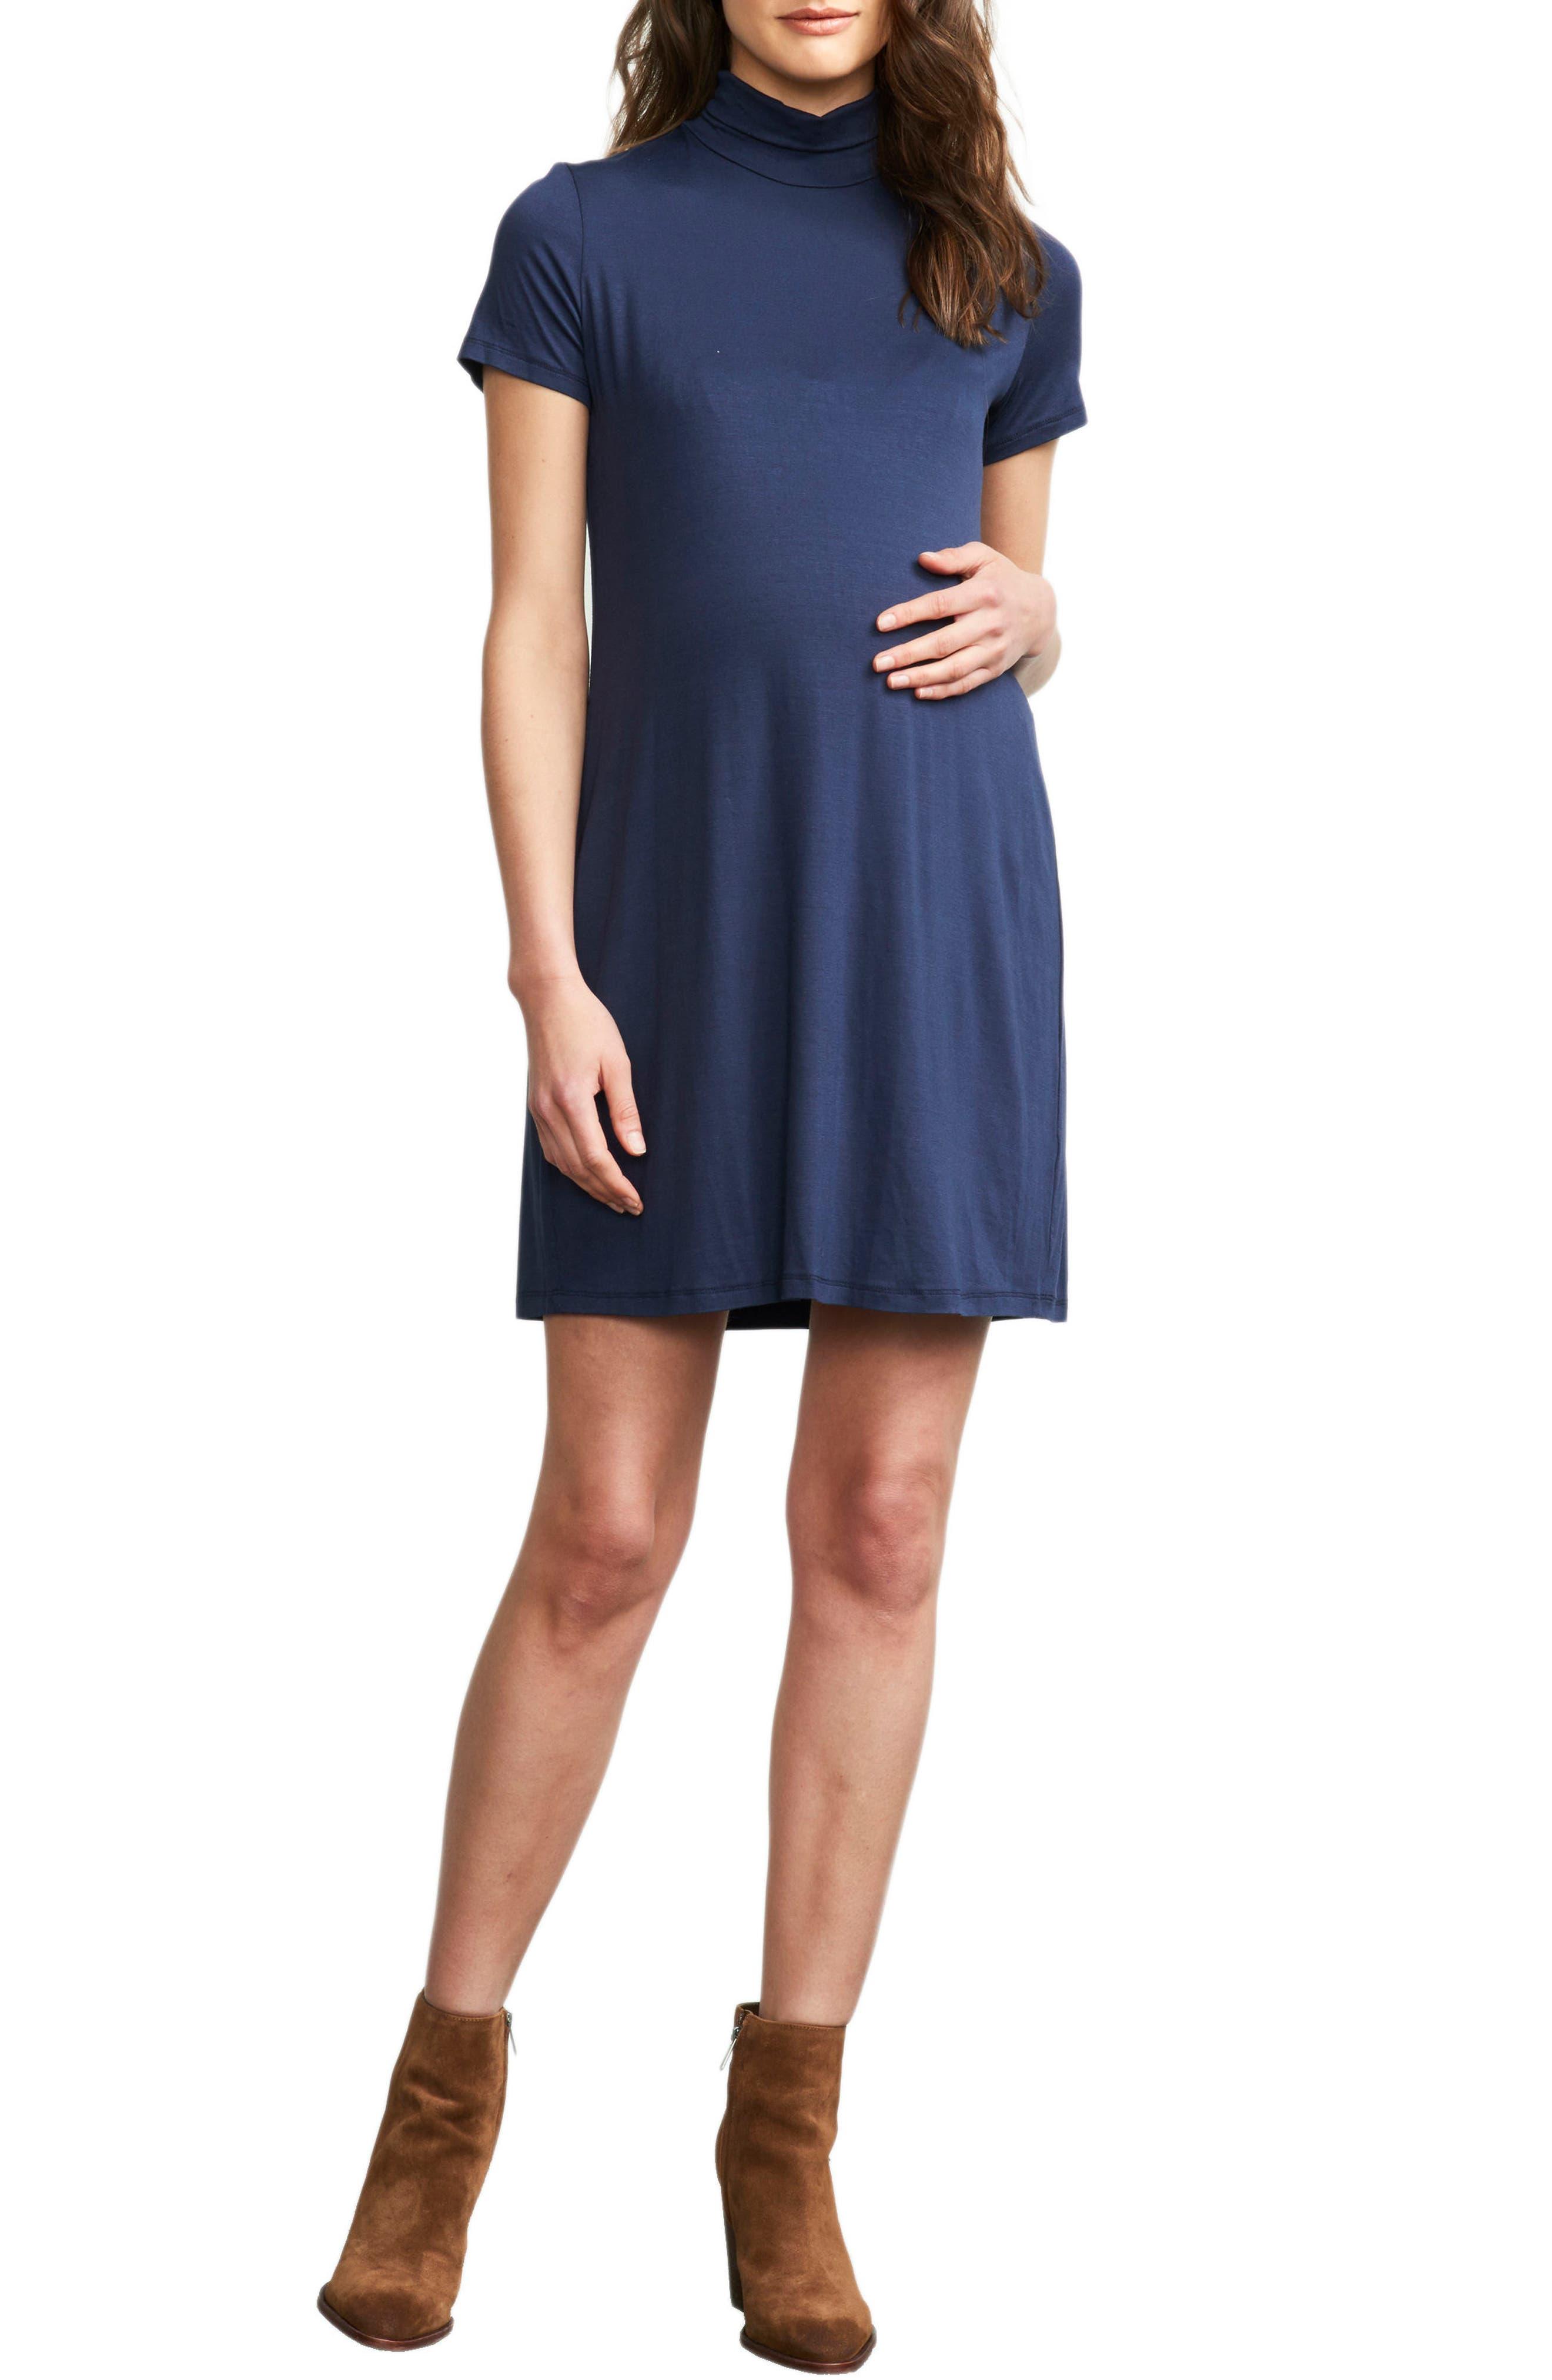 Maternal America Maternity Turtleneck Dress, Blue